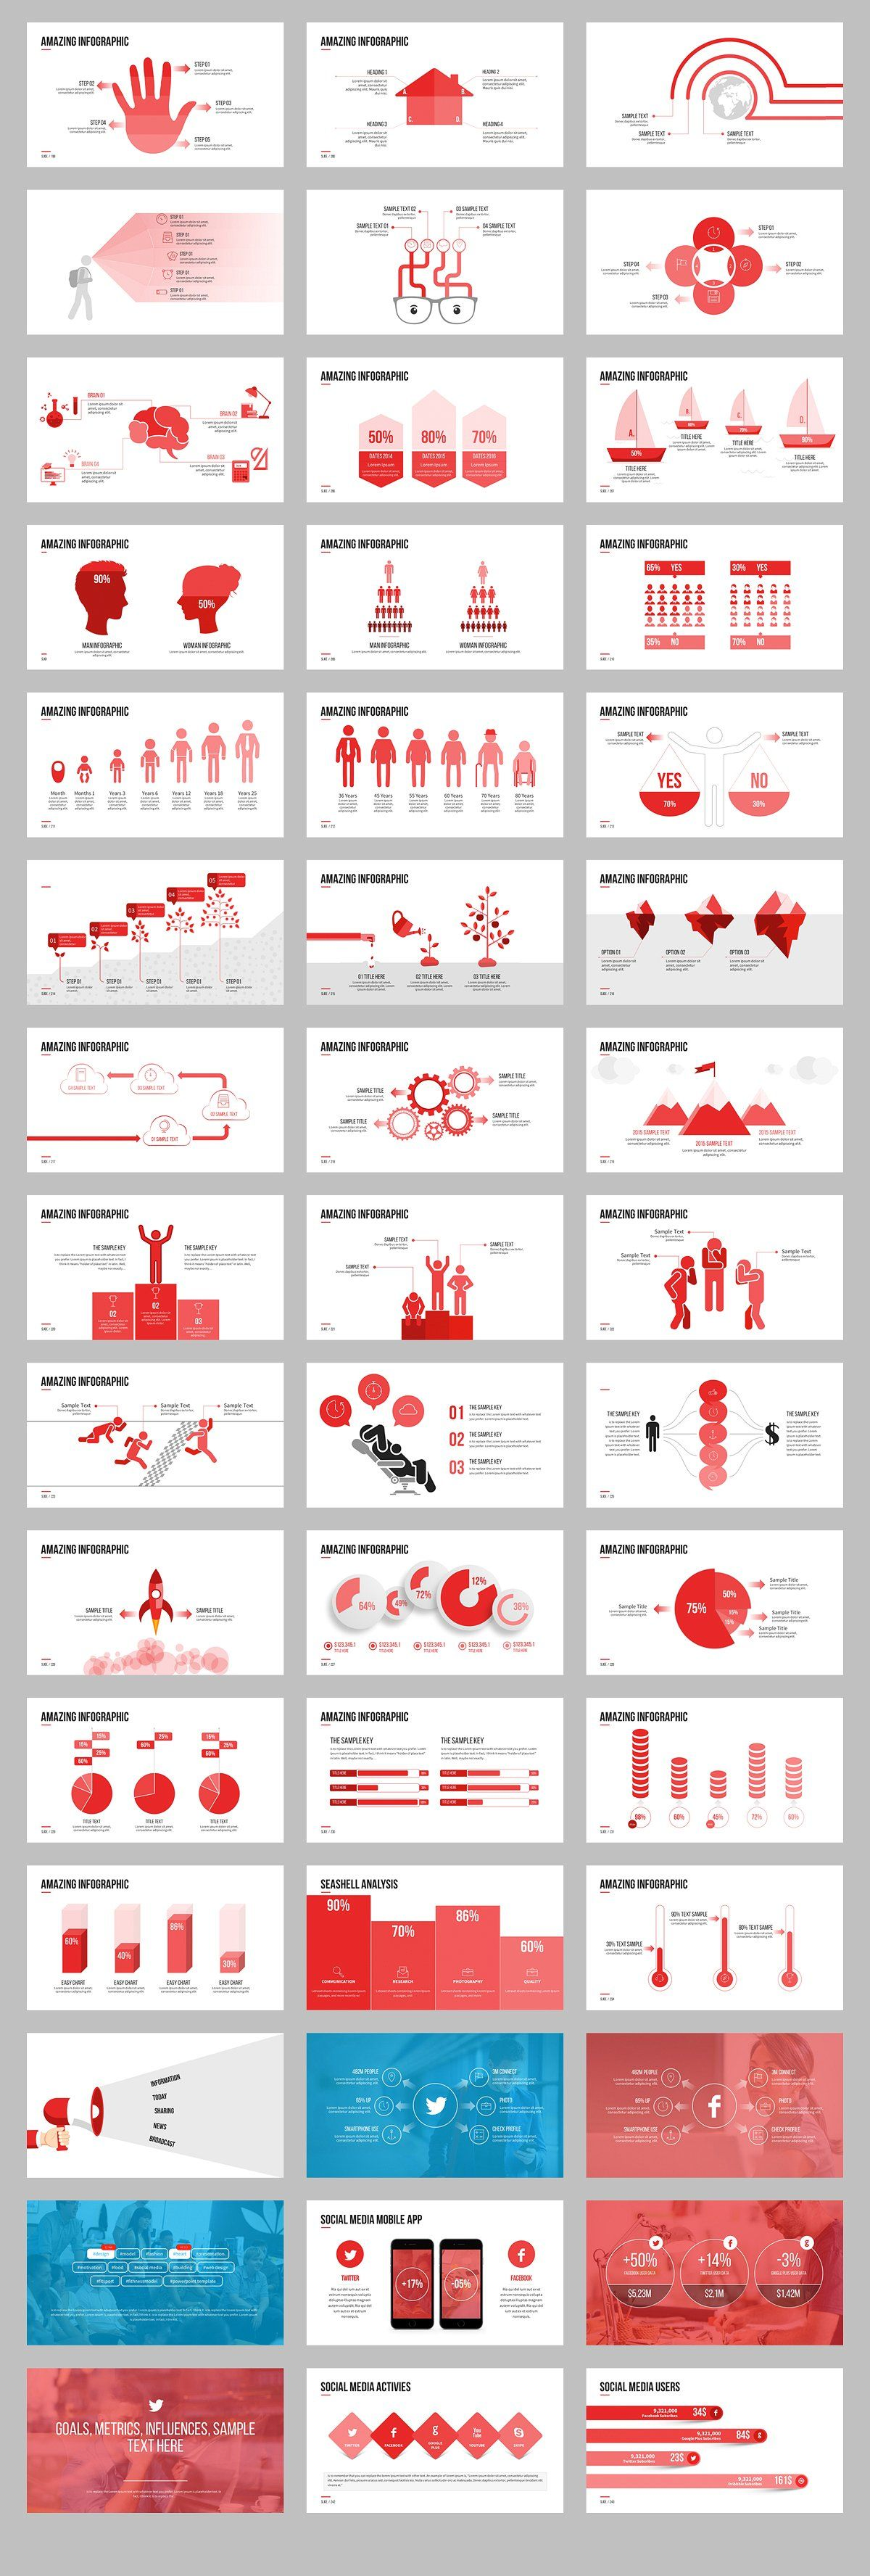 Mark04-Minimal Powerpoint Template - Presentations - 4 | infograma ...